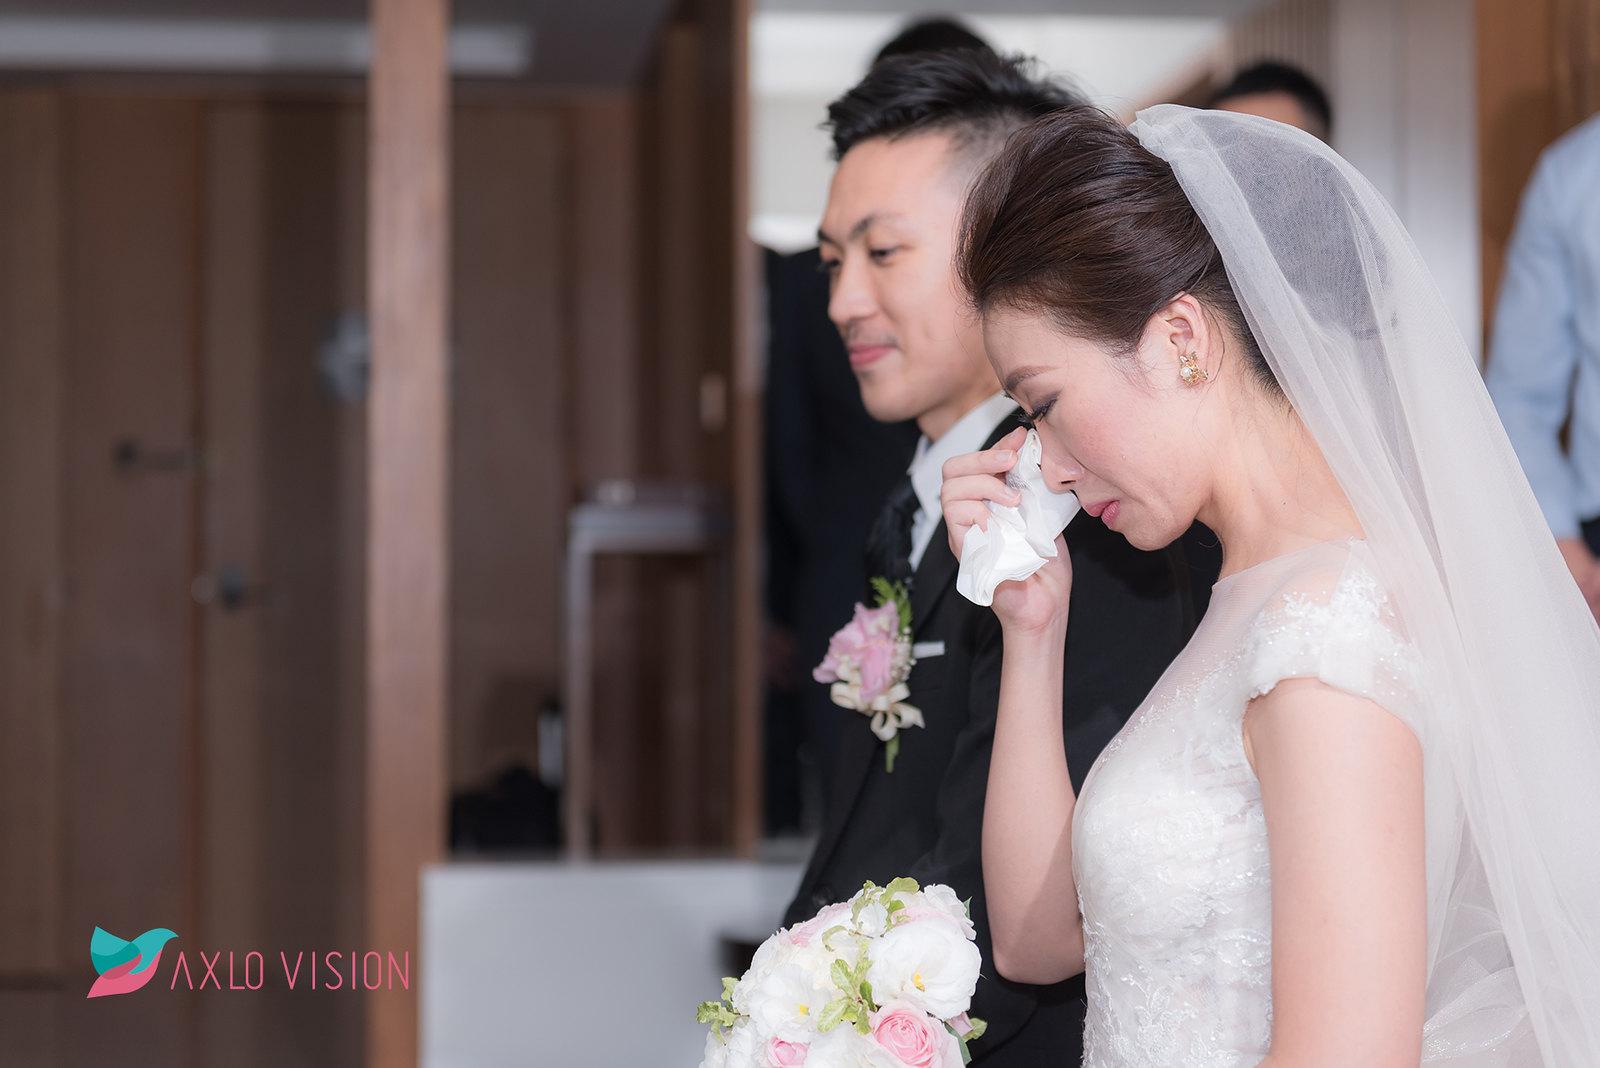 20170916 WeddingDay_100